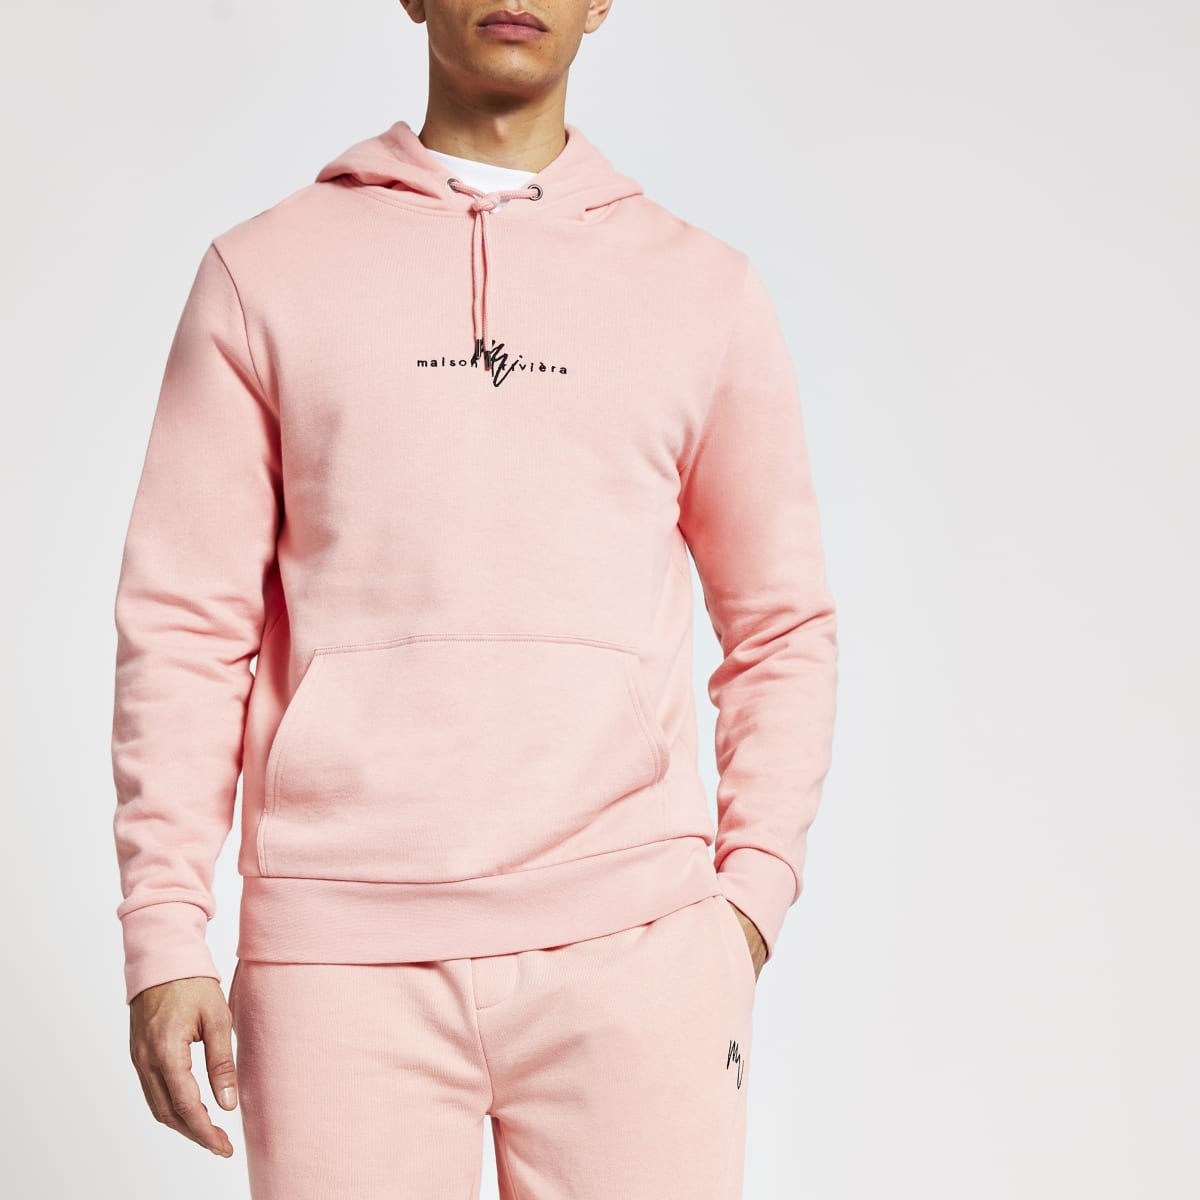 Maison Riviera coral slim fit hoodie